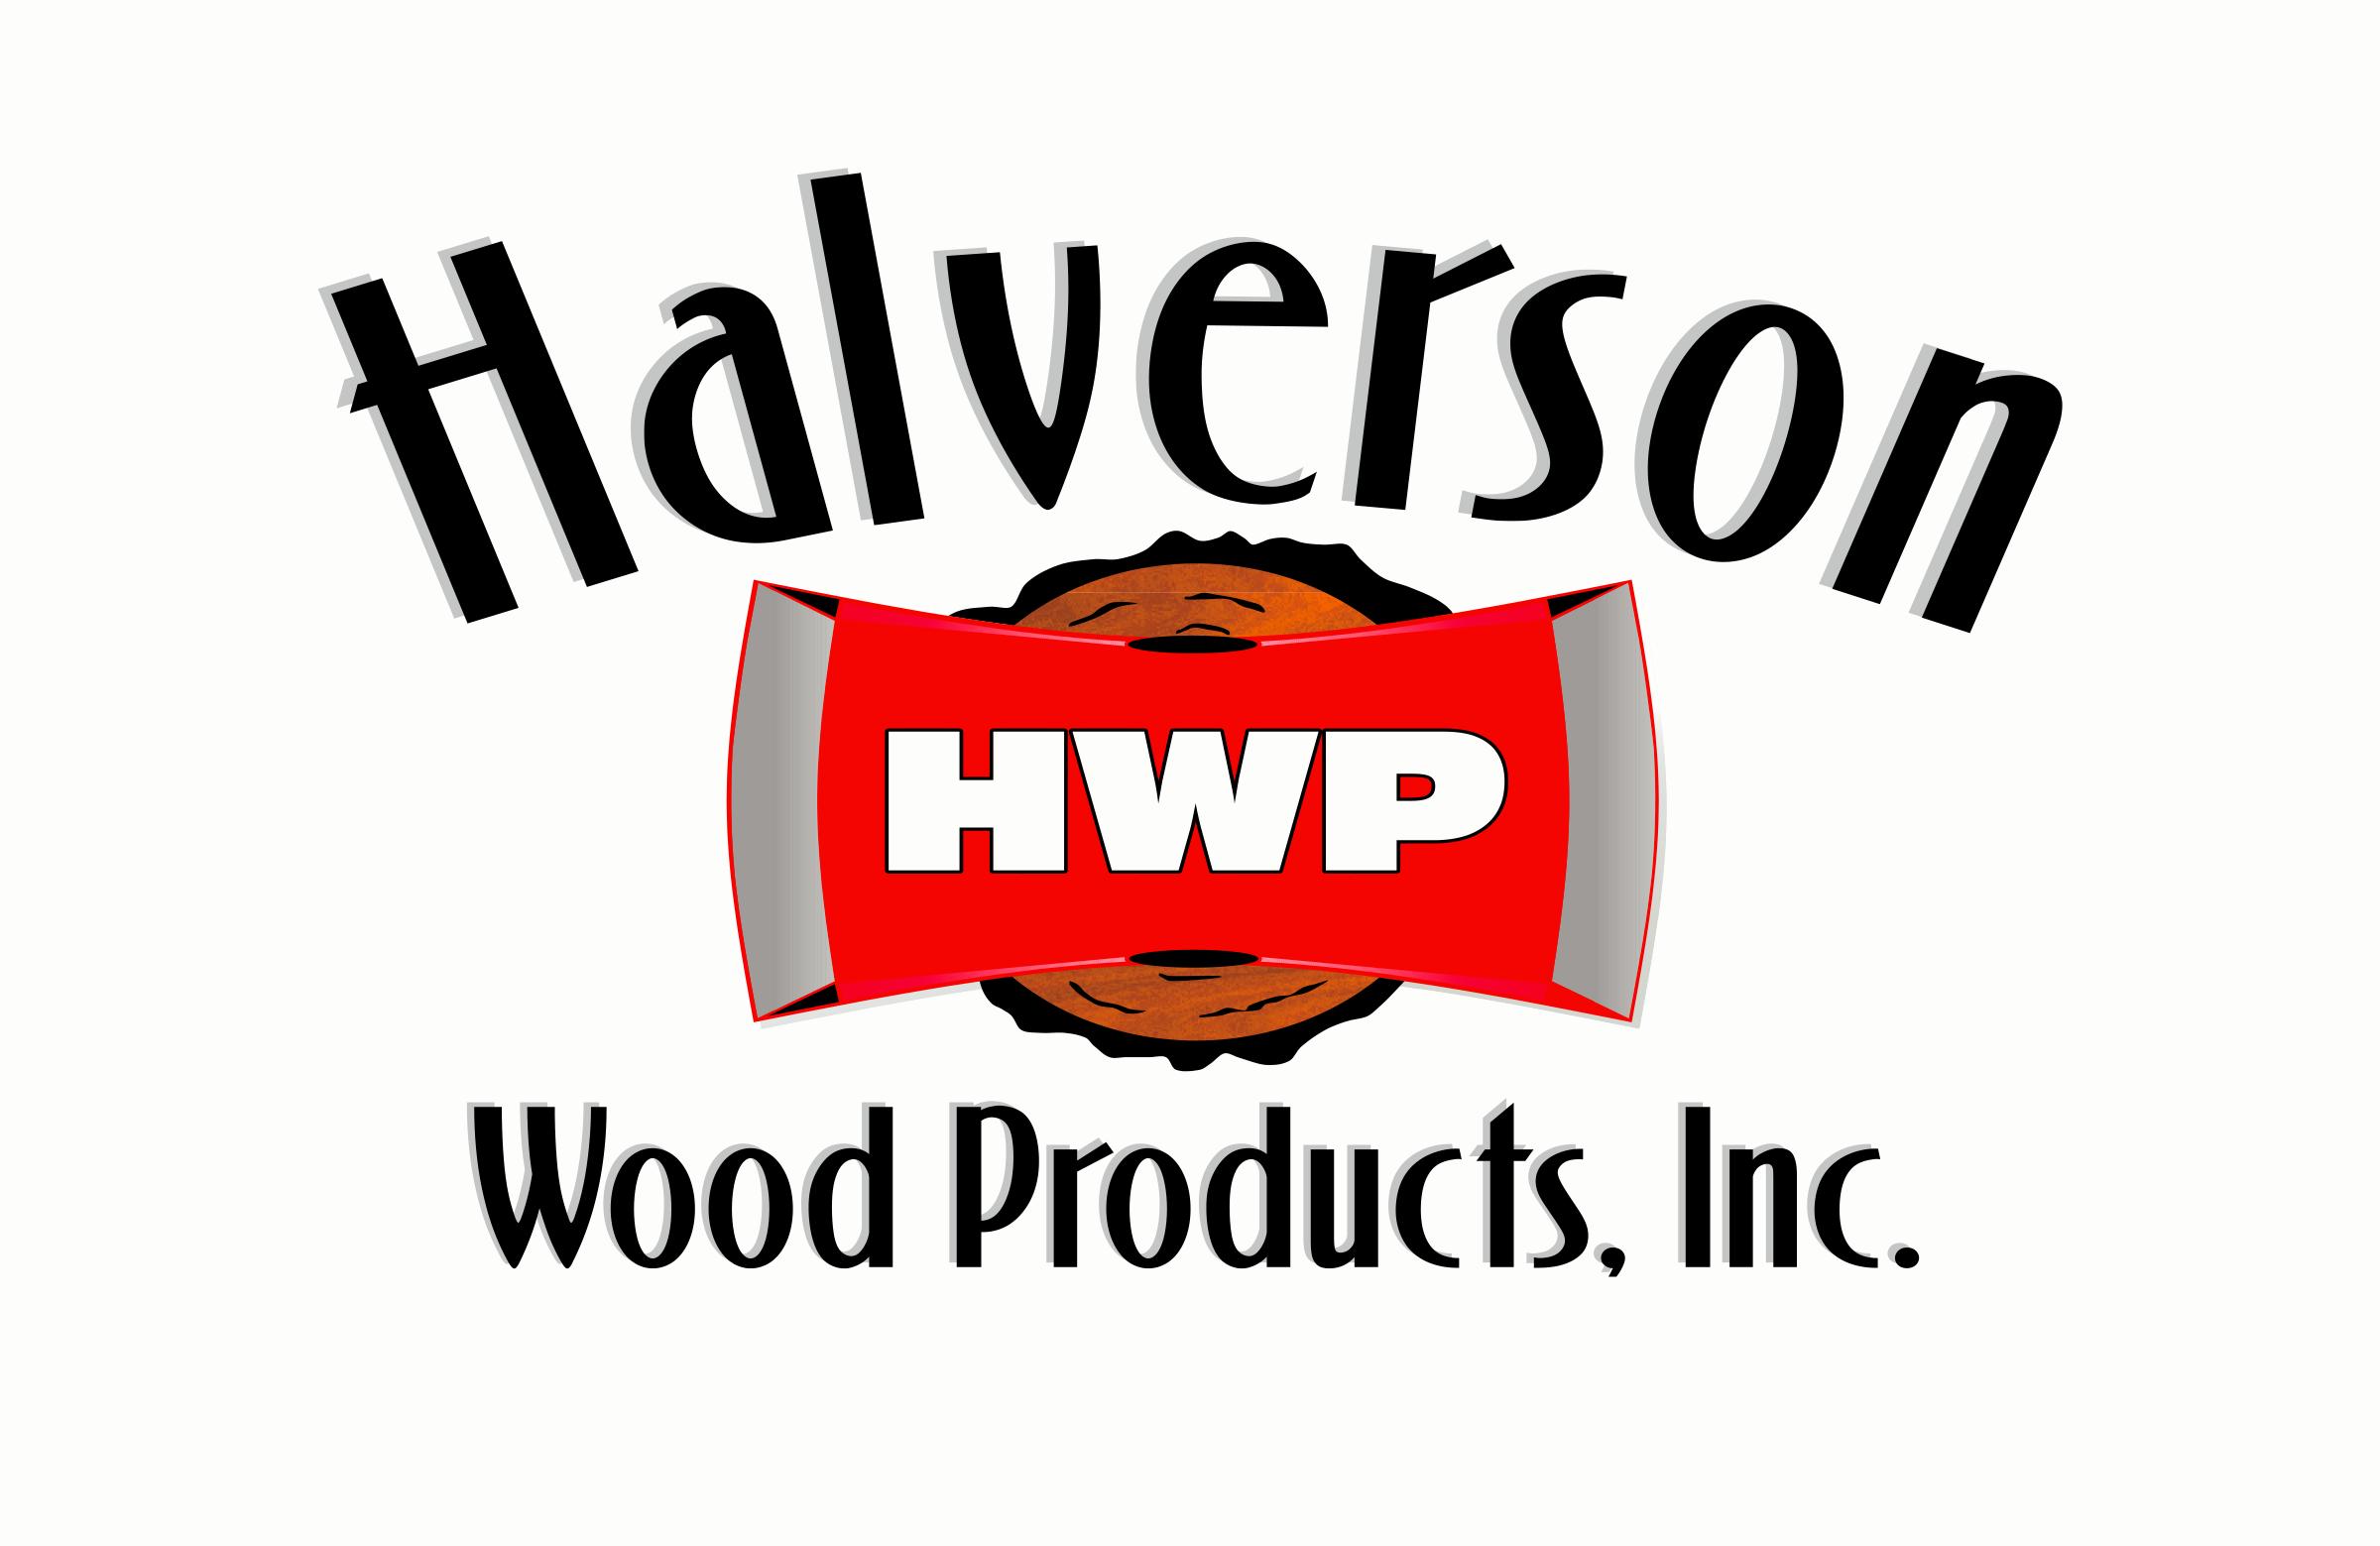 Halverson